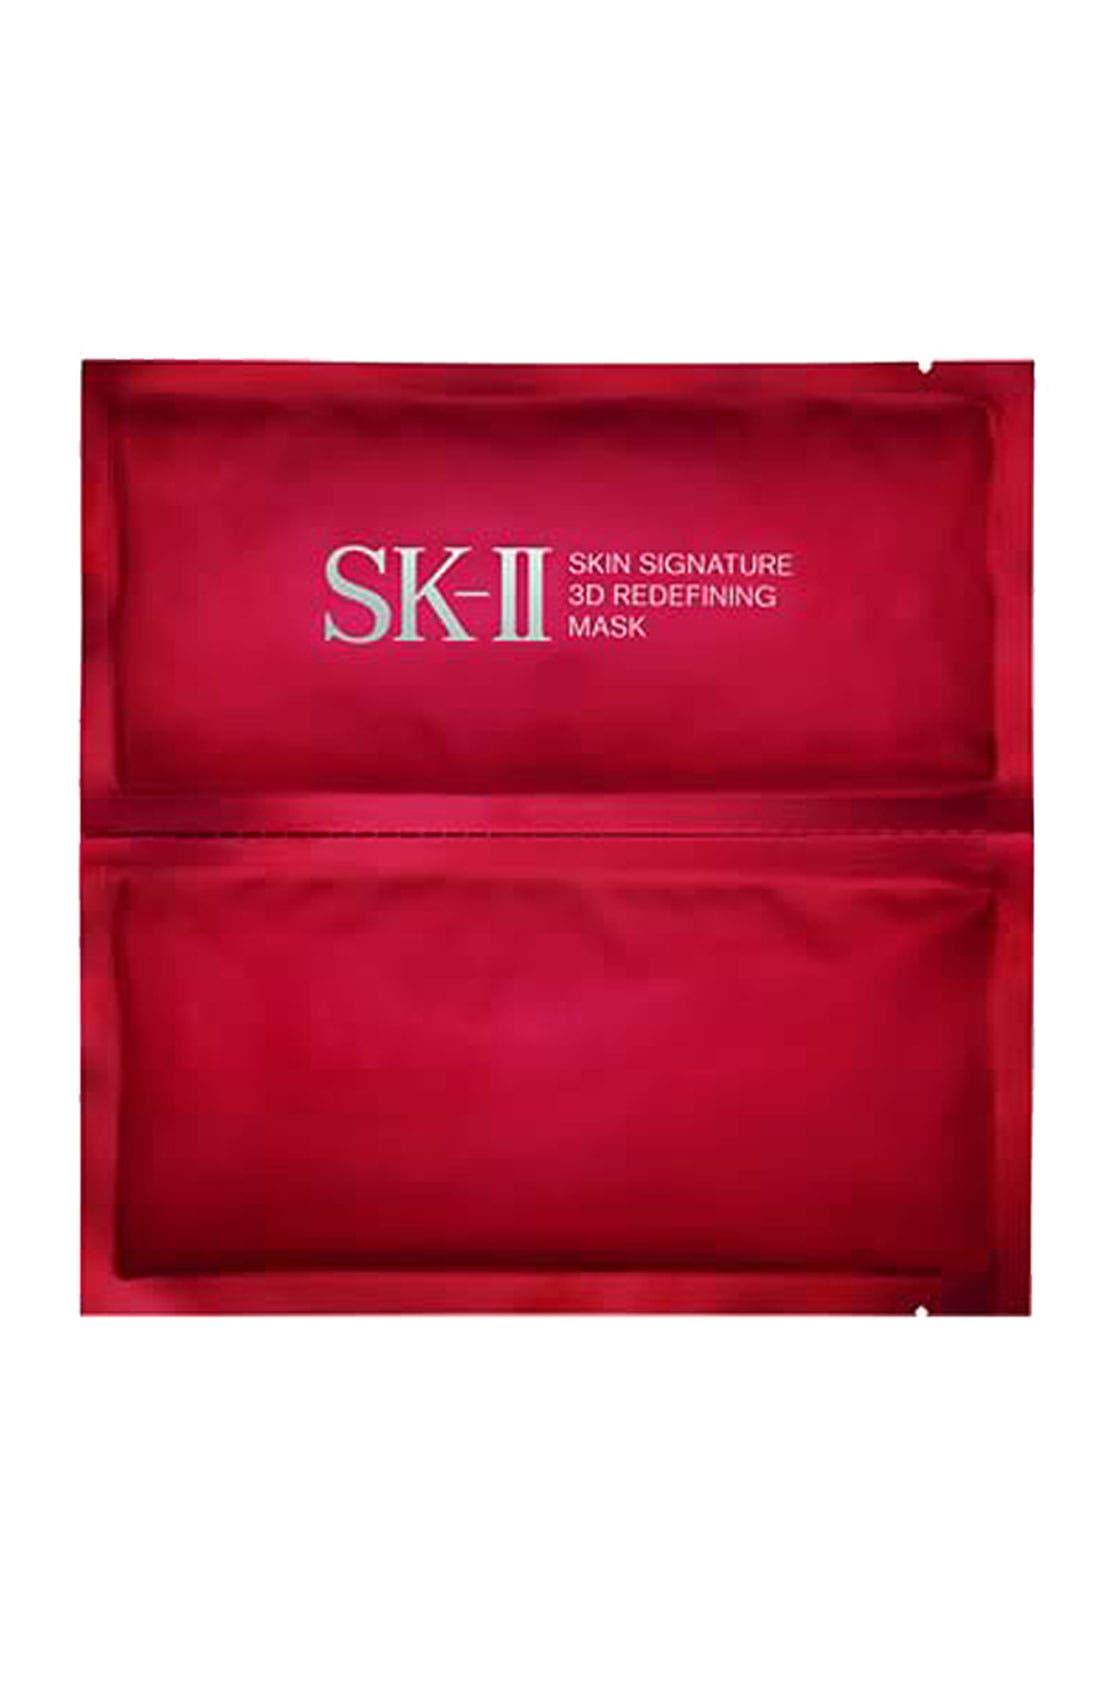 'Skin Signature' 3D Redefining Mask,                             Main thumbnail 1, color,                             000